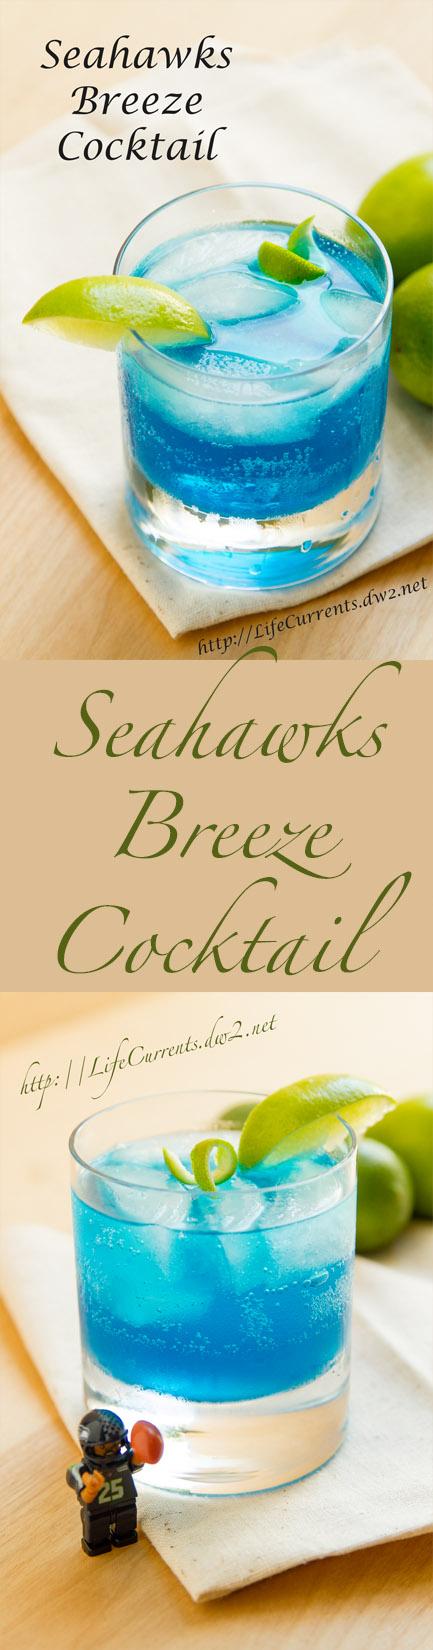 Seahawks Breeze Cocktail